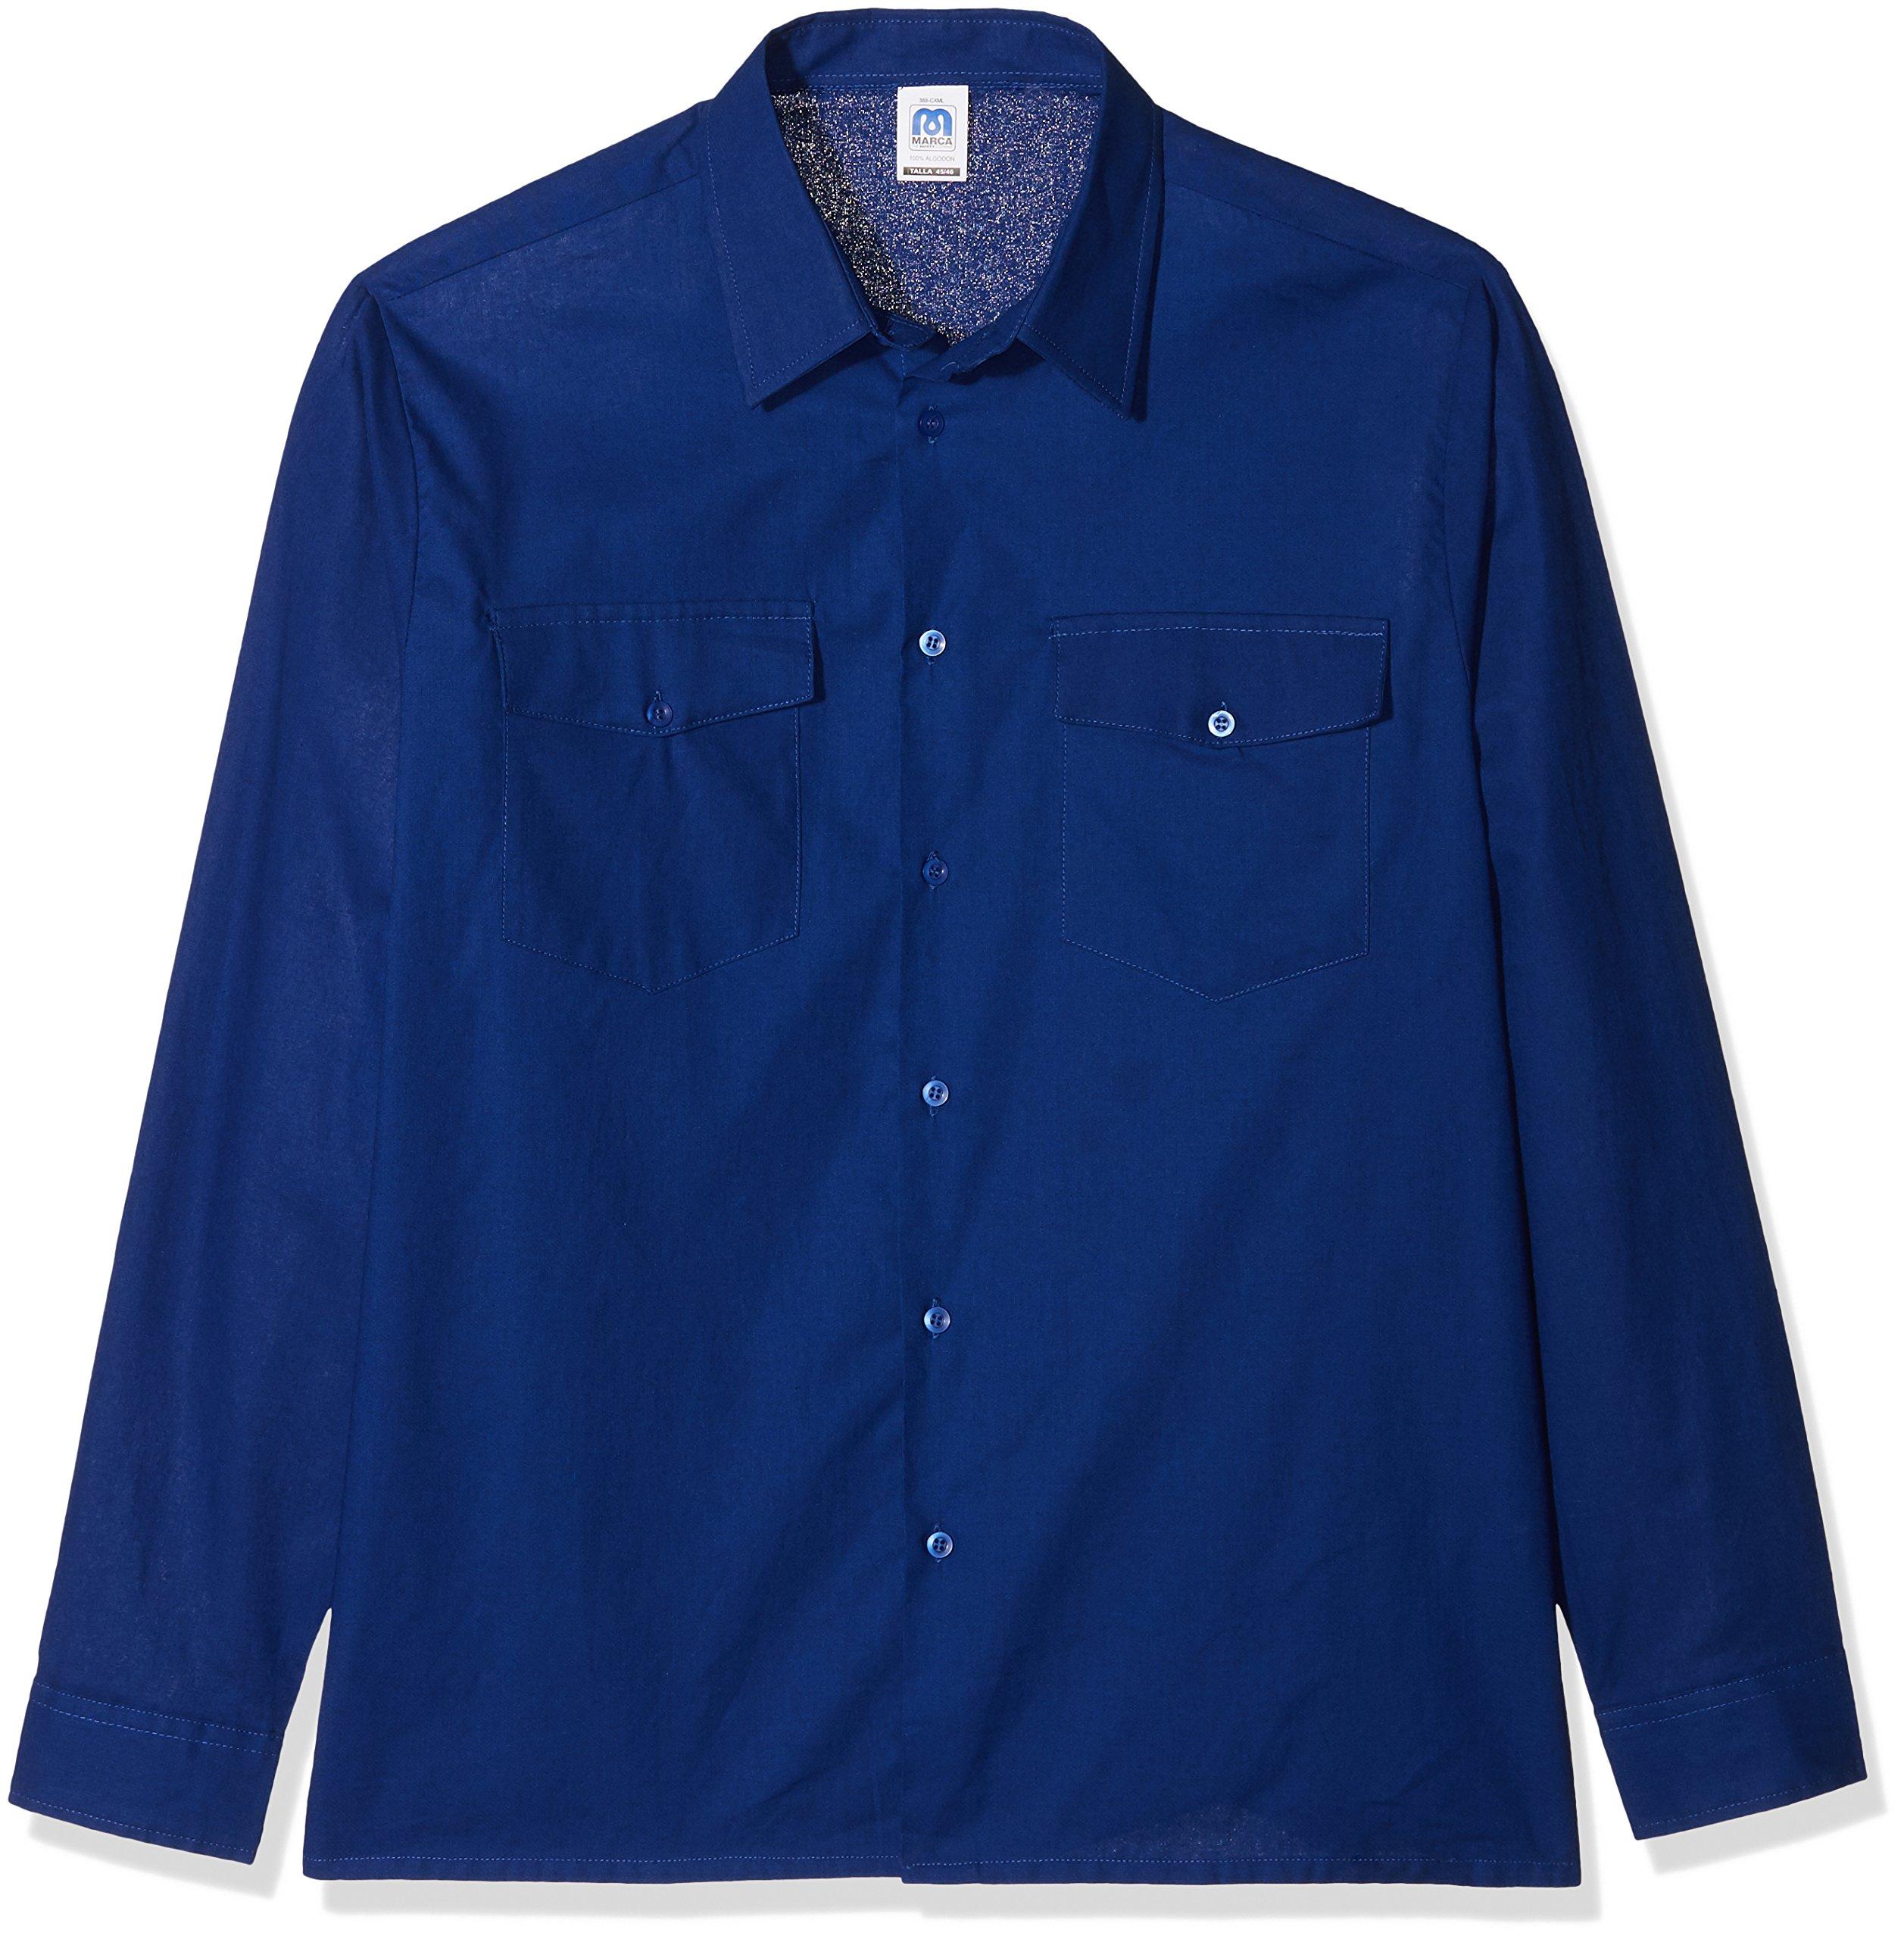 Marca 388-CXML4546 - Camisa manga larga algodon talla 45-46 azulina: Amazon.es: Bricolaje y herramientas